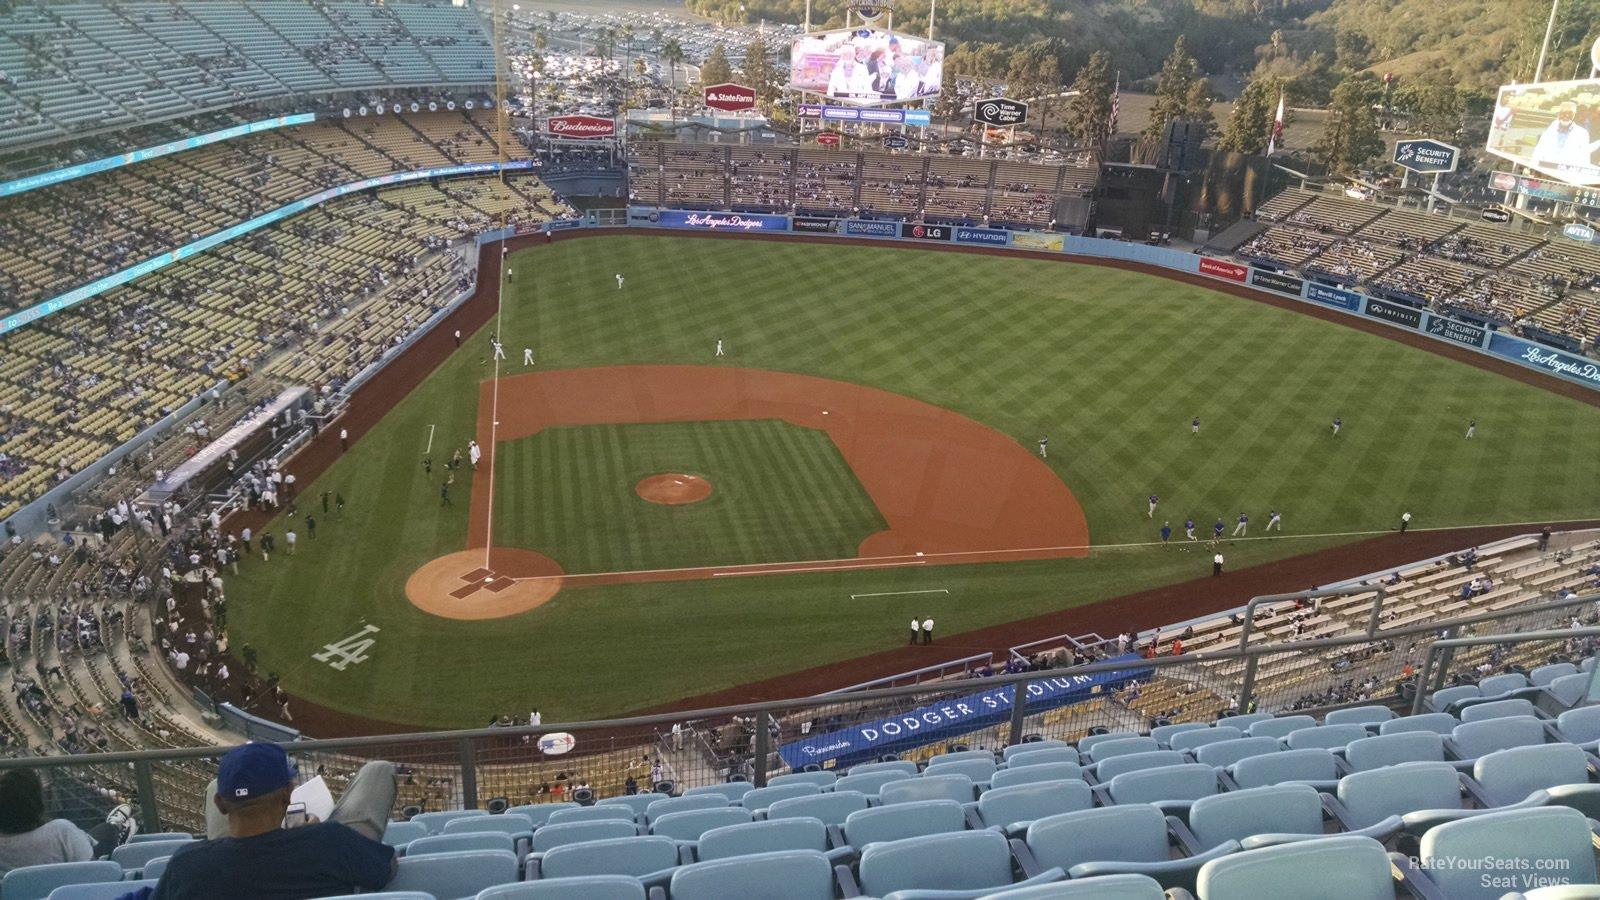 Top Deck - Dodger Stadium Baseball Seating - RateYourSeats.com